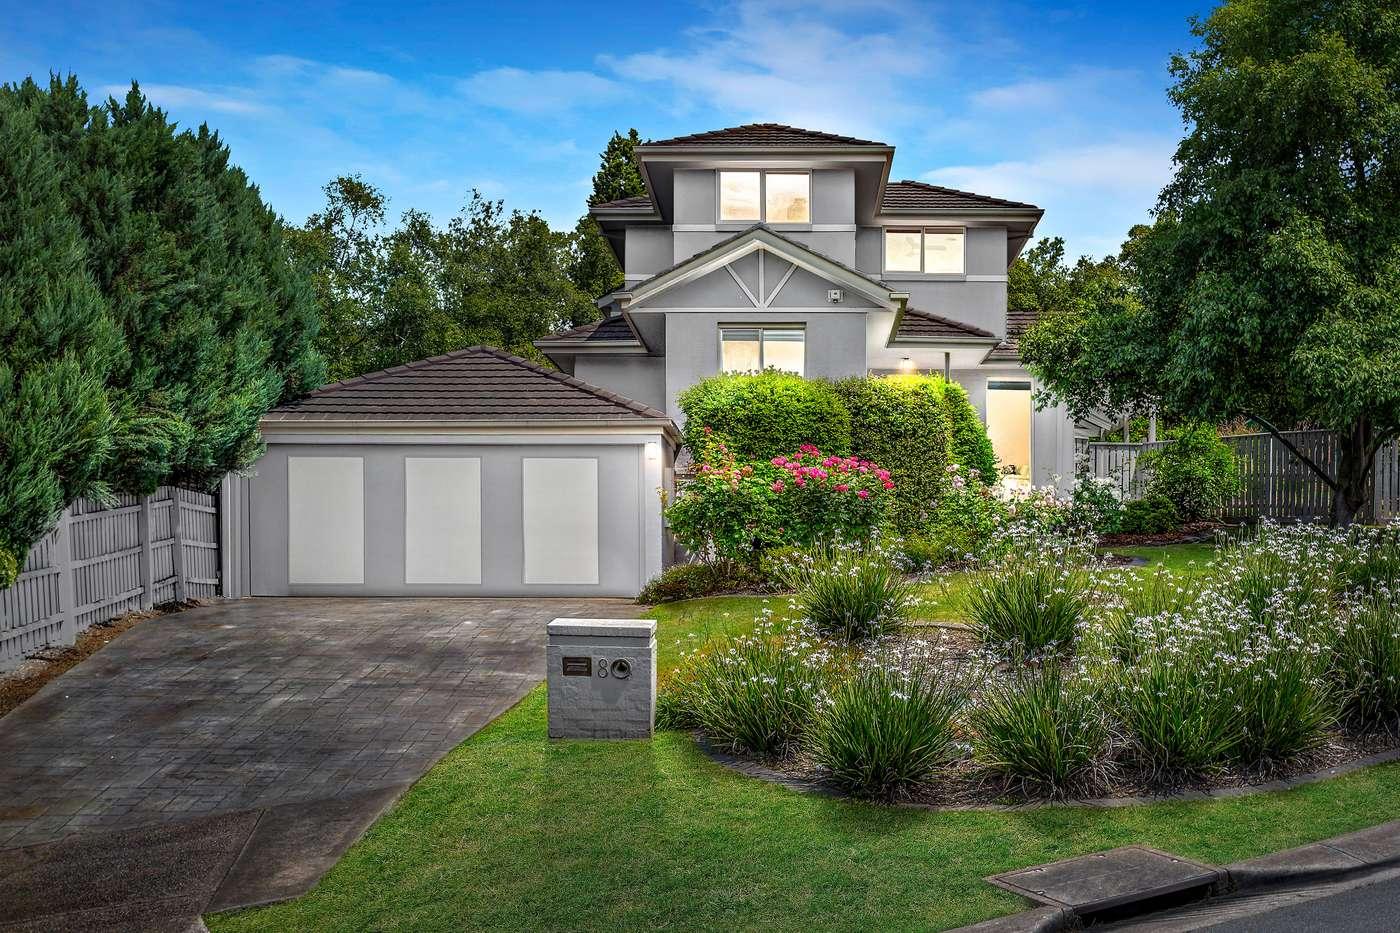 Main view of Homely house listing, 8 Arthur Streeton Place, Diamond Creek, VIC 3089